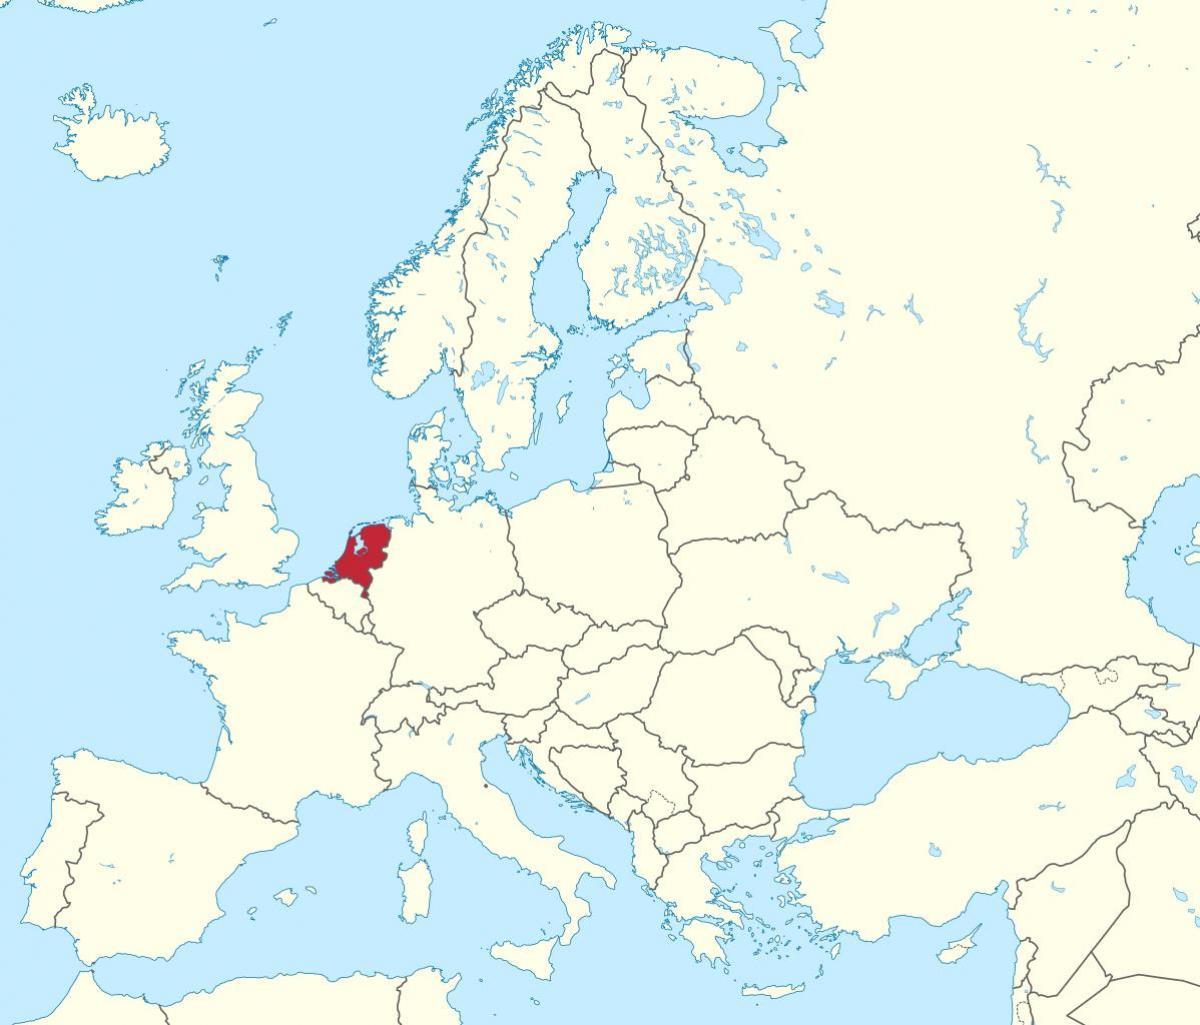 karta holland Holland europa karta   Holland karta i europa (Väst Europa   Europa) karta holland